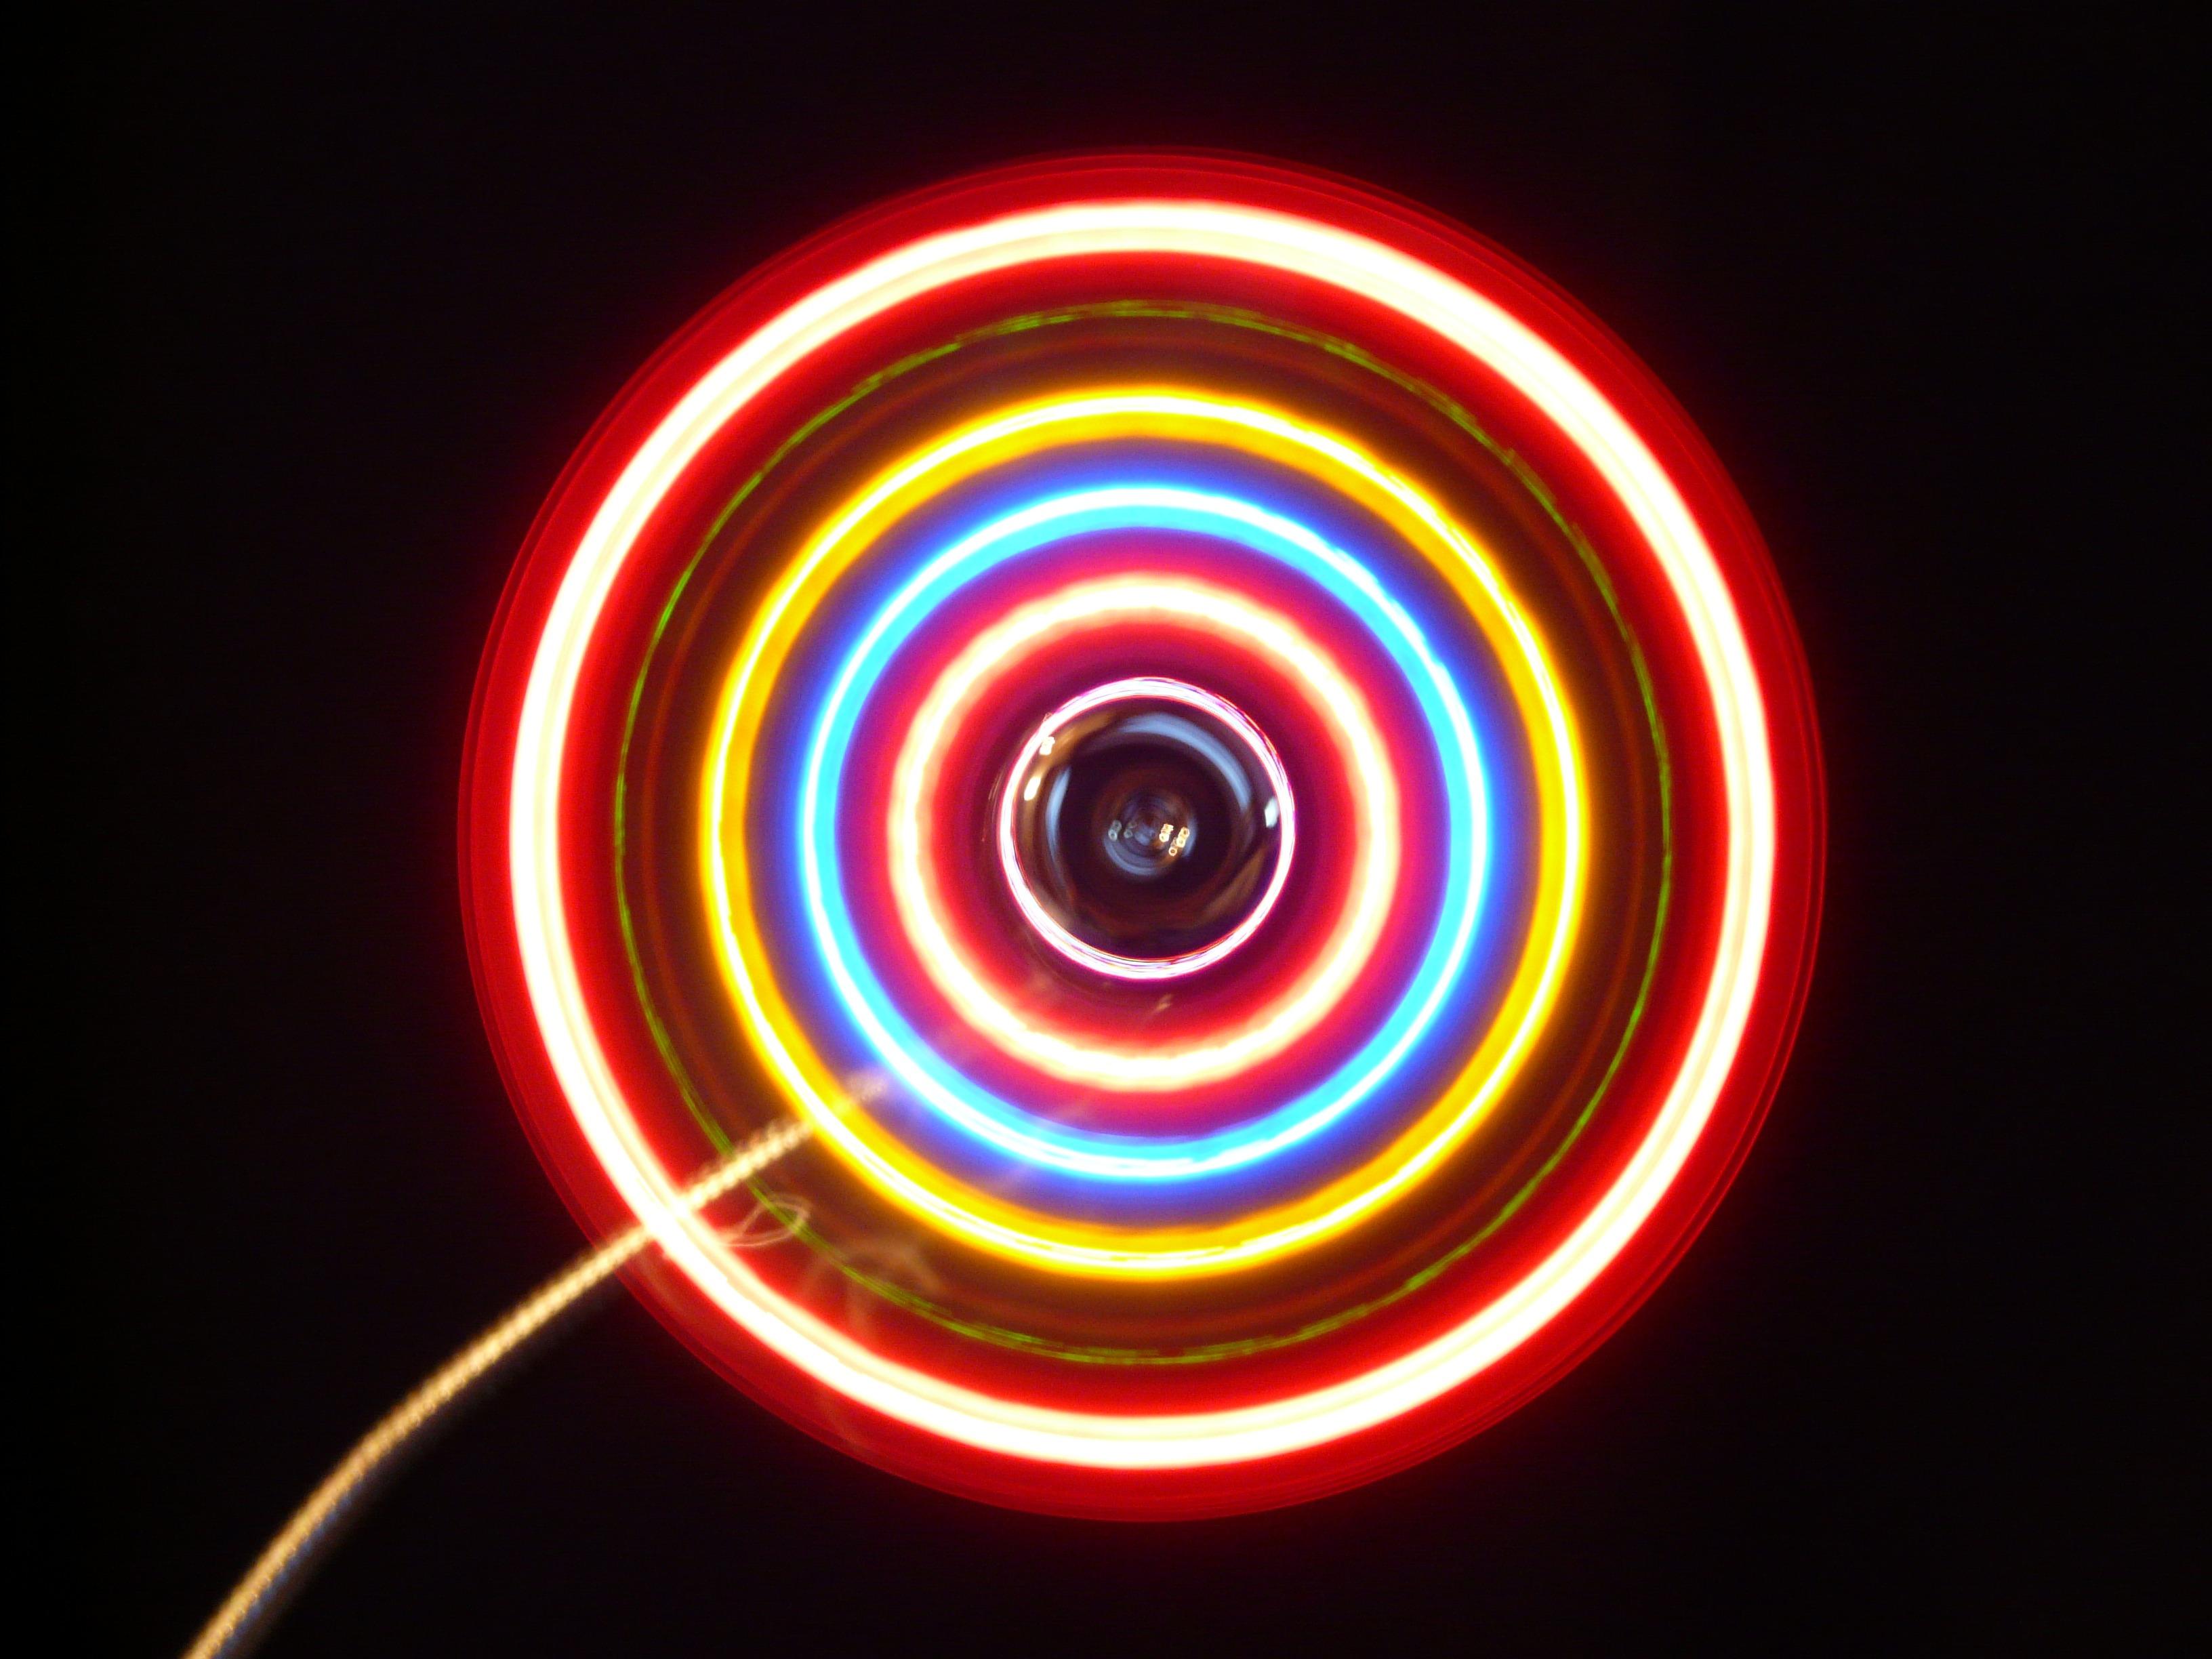 Free Images : light, night, air, spiral, mystical, dark, pattern ...